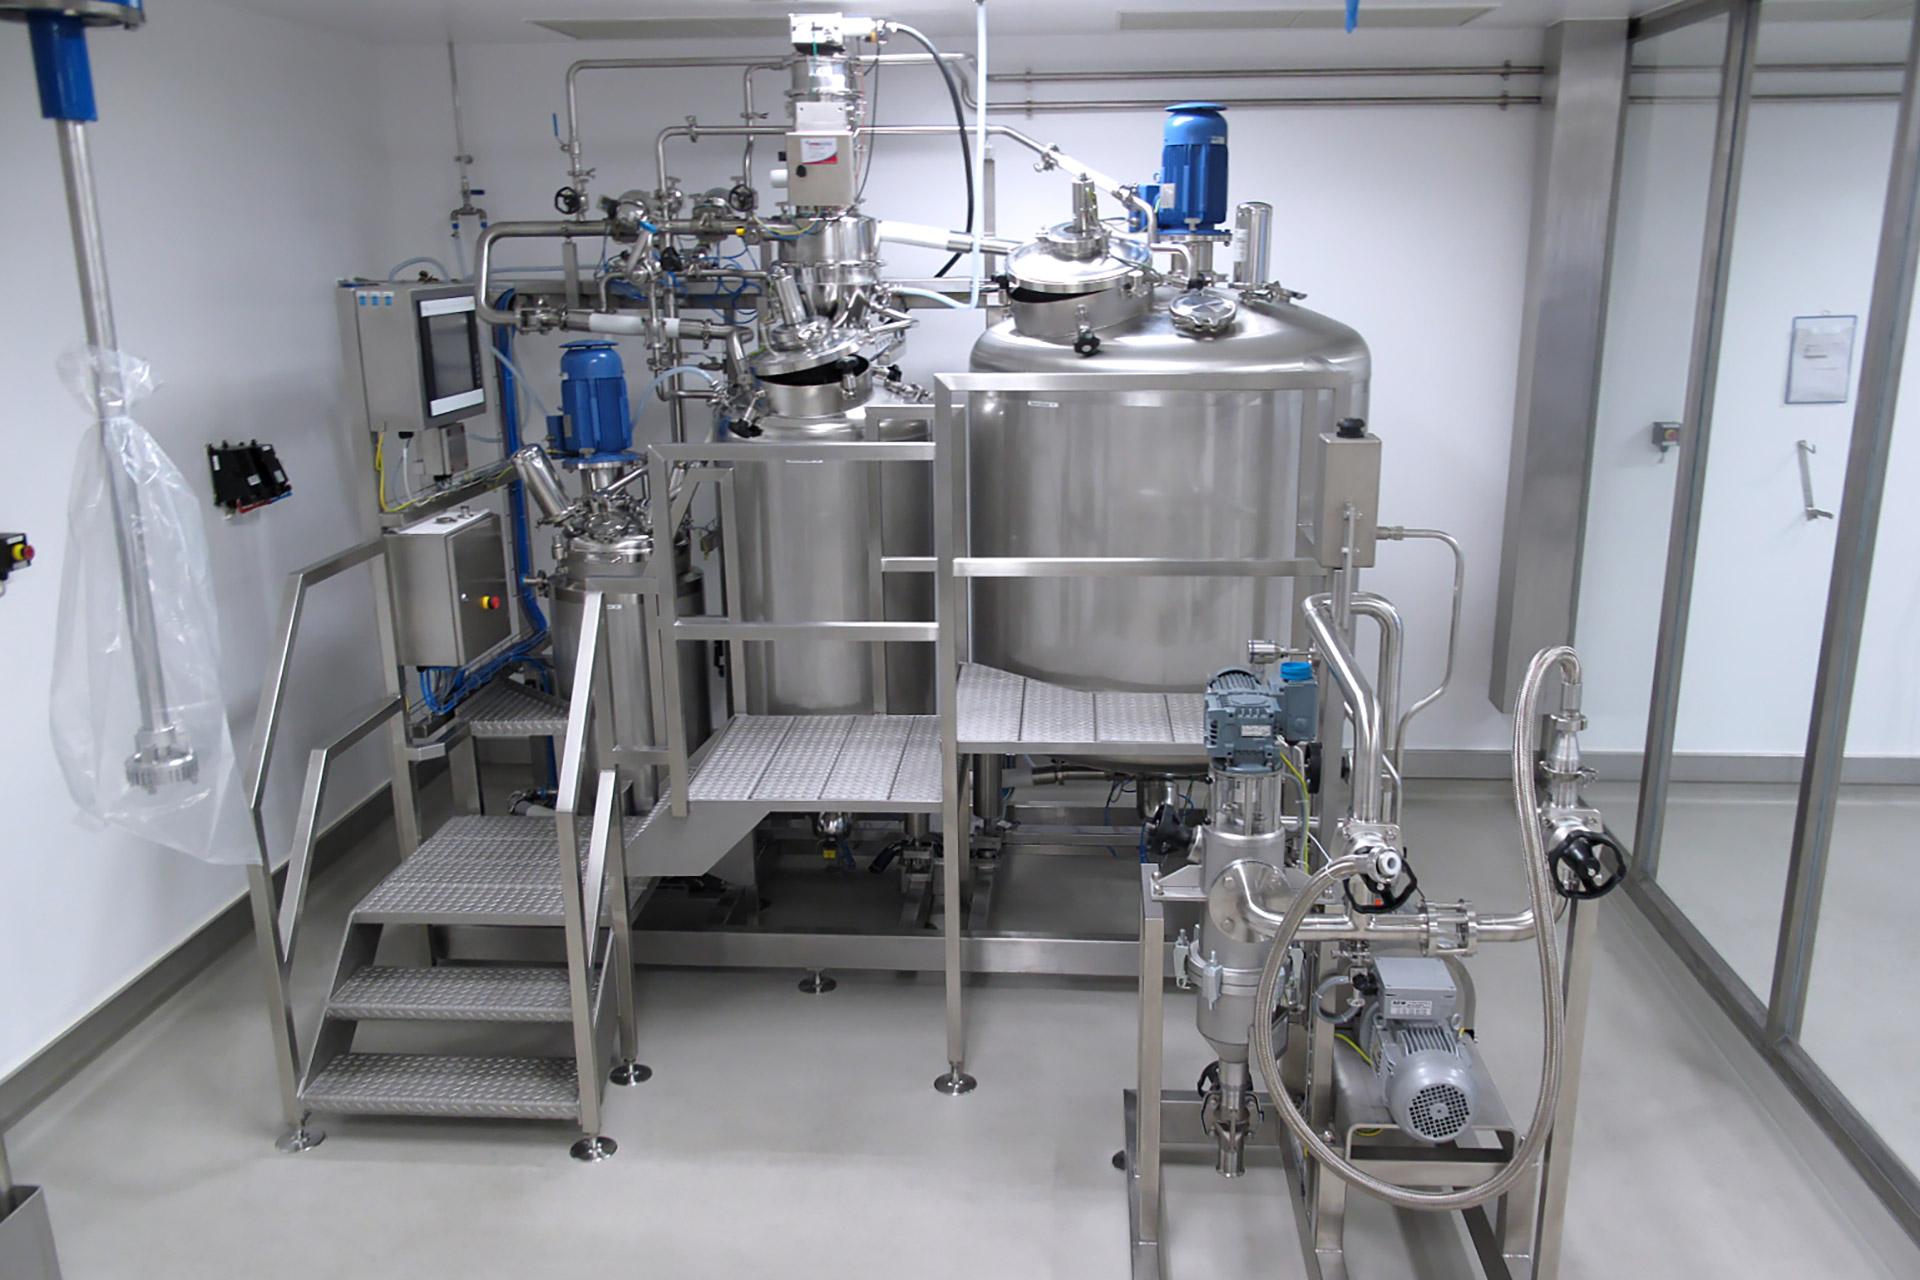 poeschl_anlagenbau_Pharma_Almirall-Hermal-Verrumal